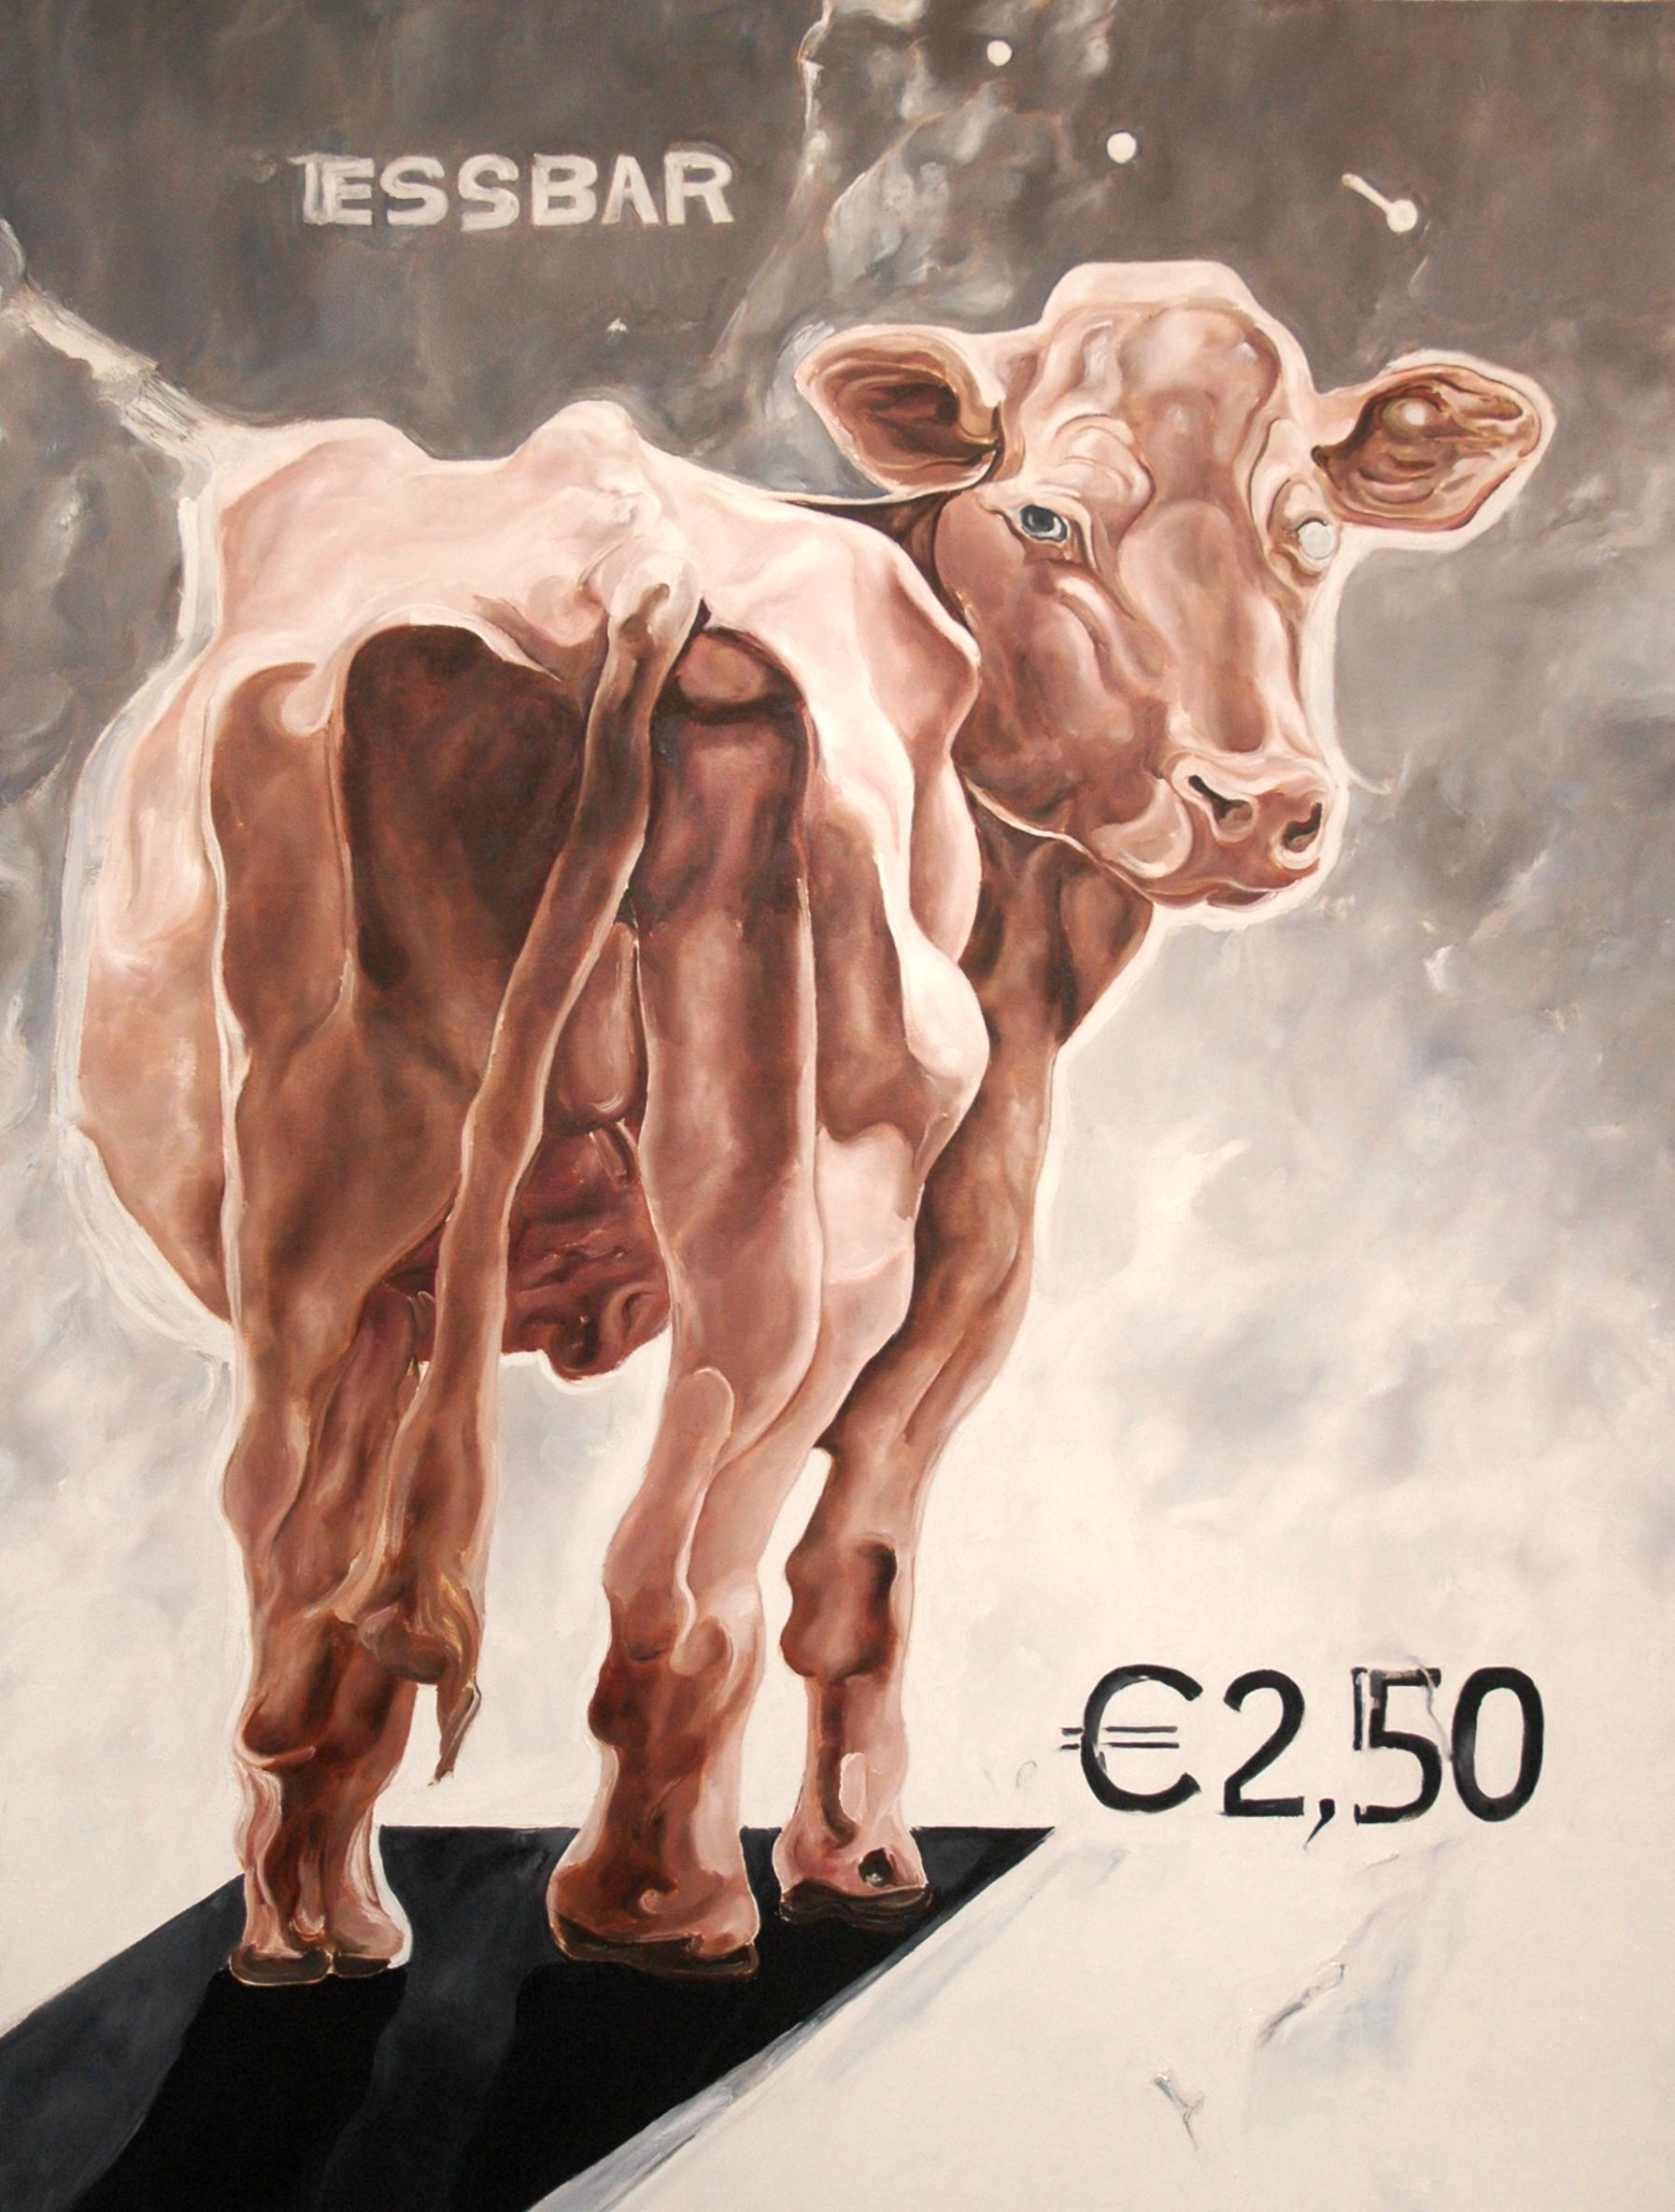 Öl auf Leinwand, 2019, 190 cm x 135 cm     2800 €